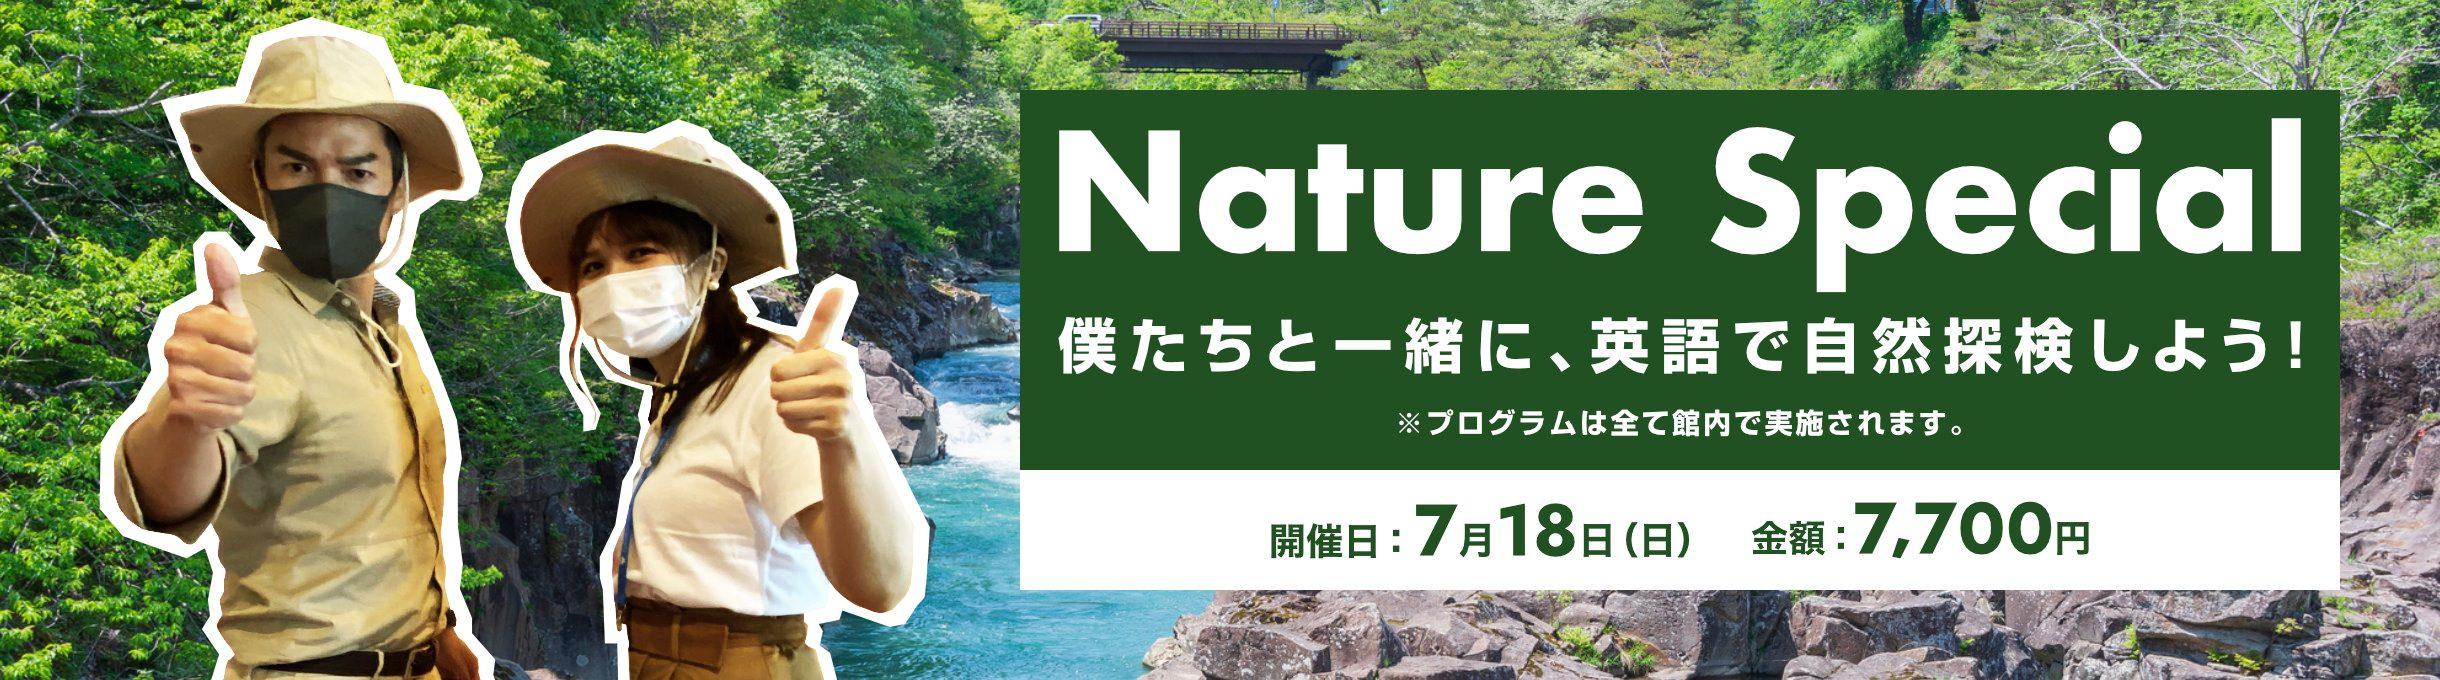 Nature Special 僕たちと一緒に、英語で自然探検しよう! 7月18日(日) 7,700円(税込)